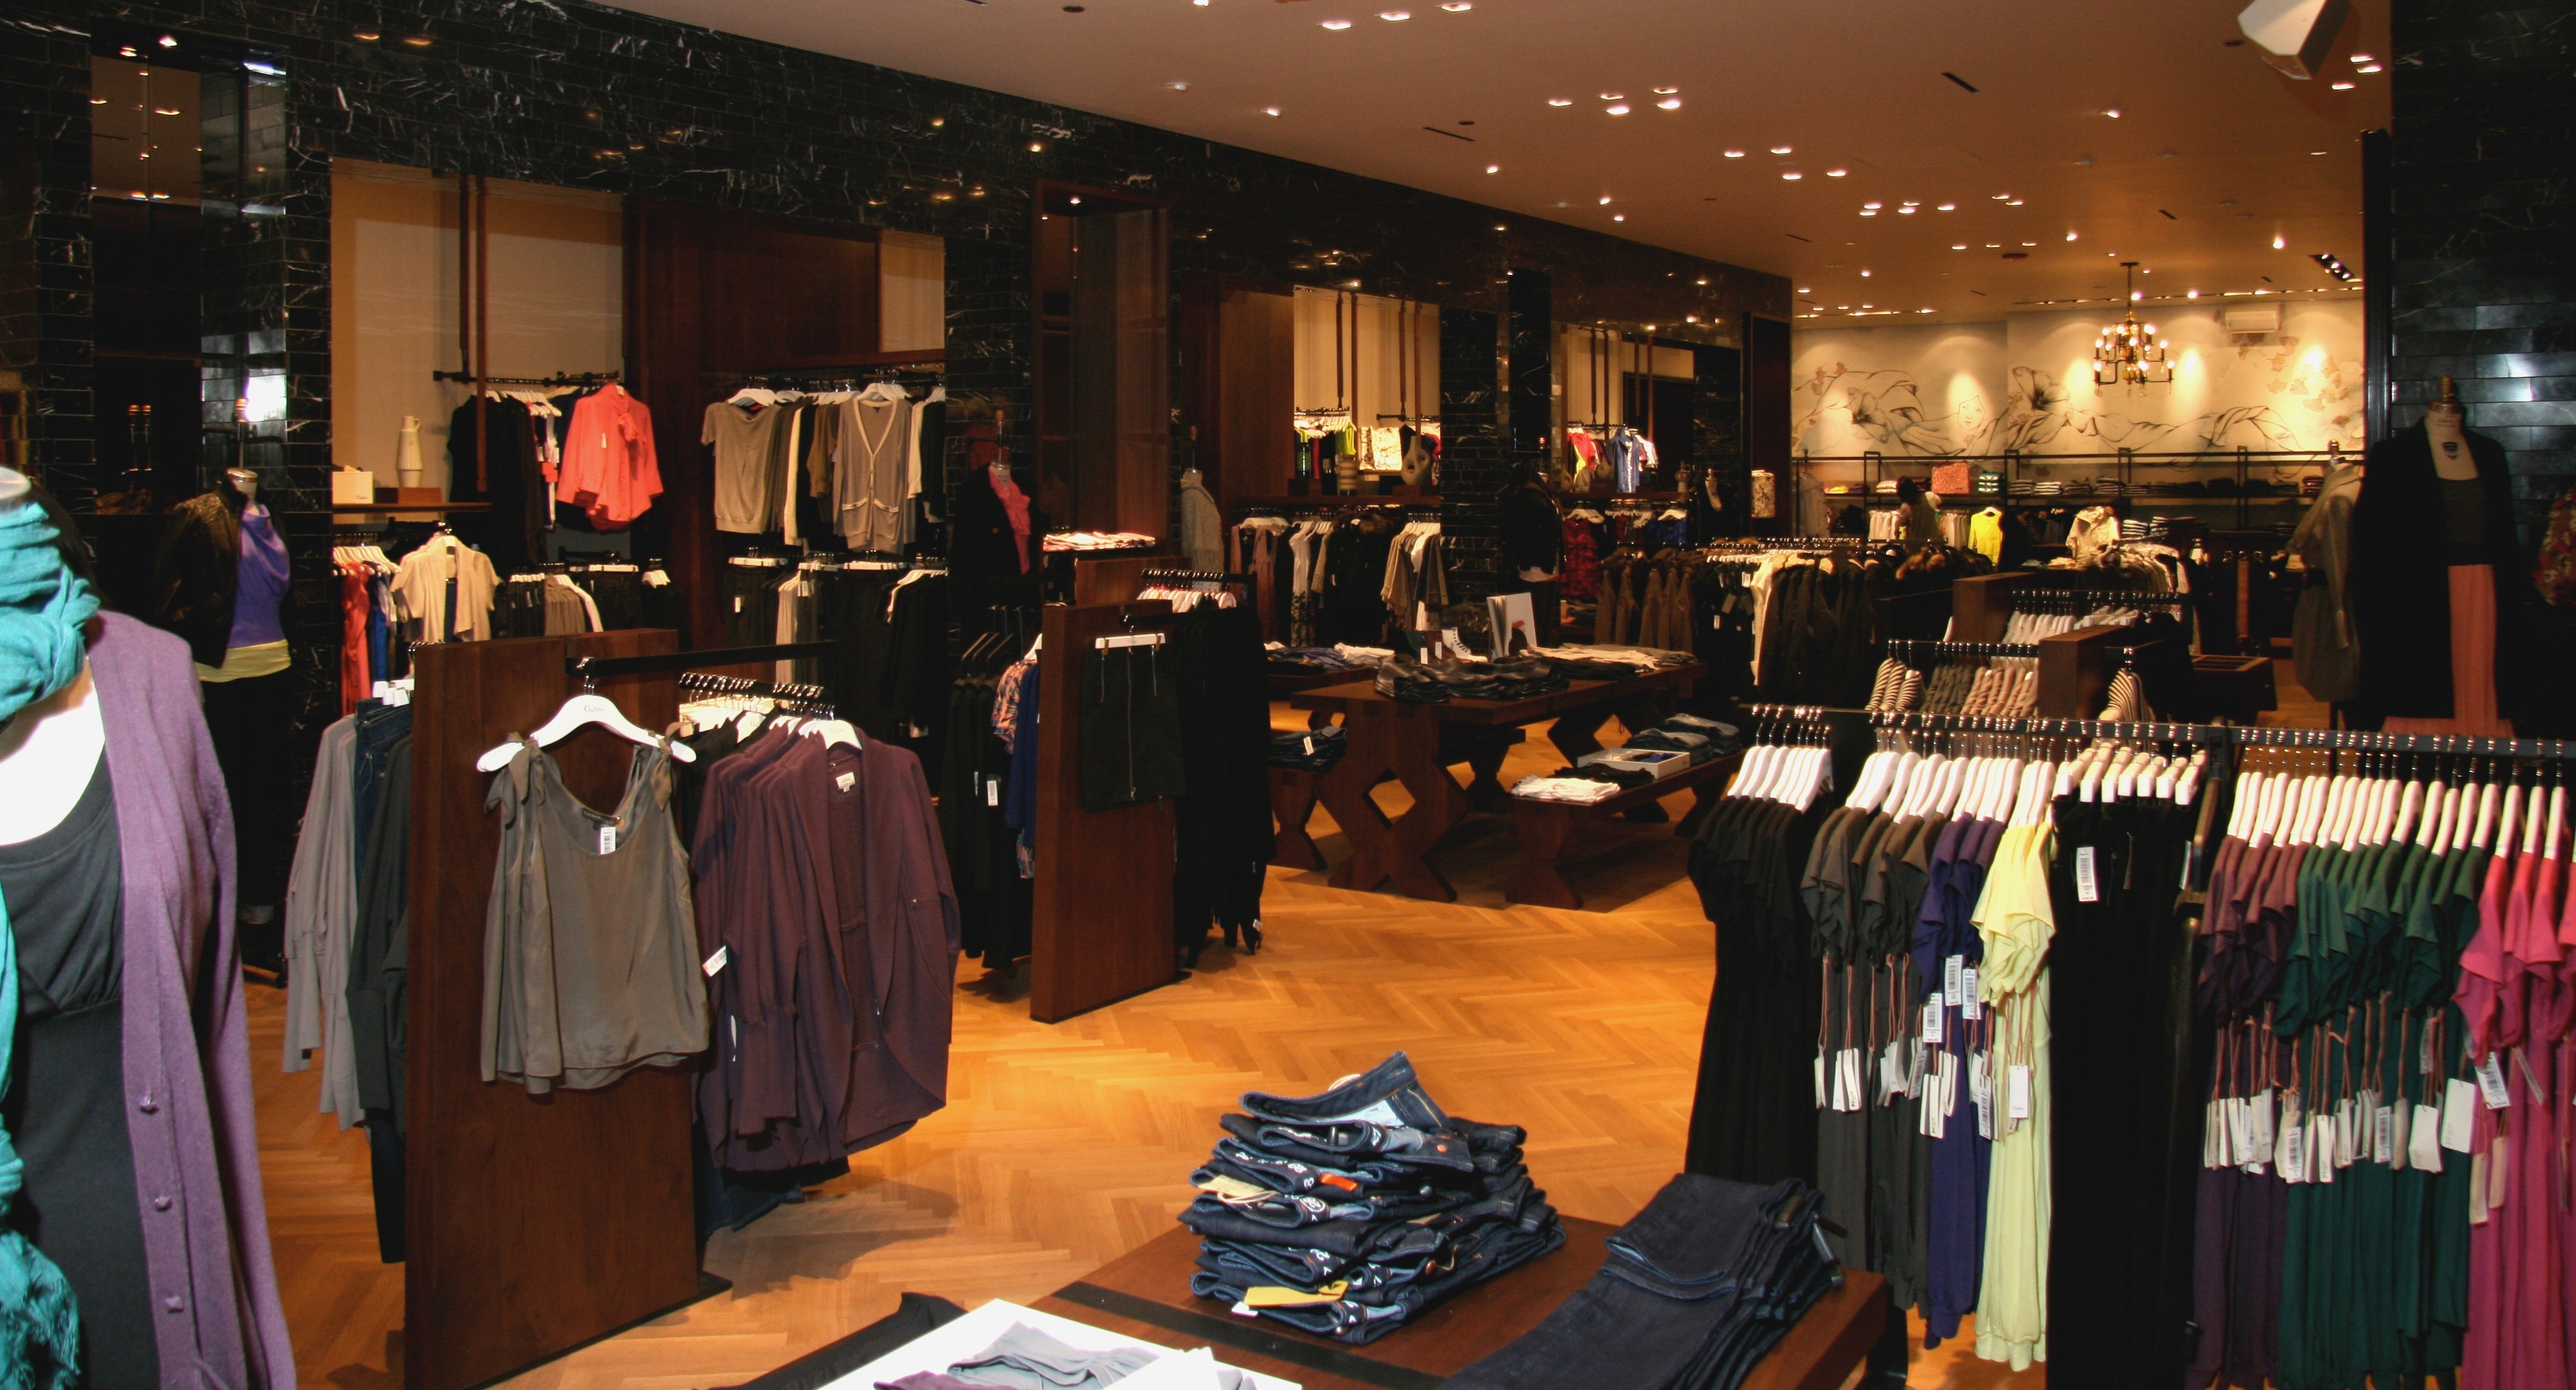 Nbc clothing store